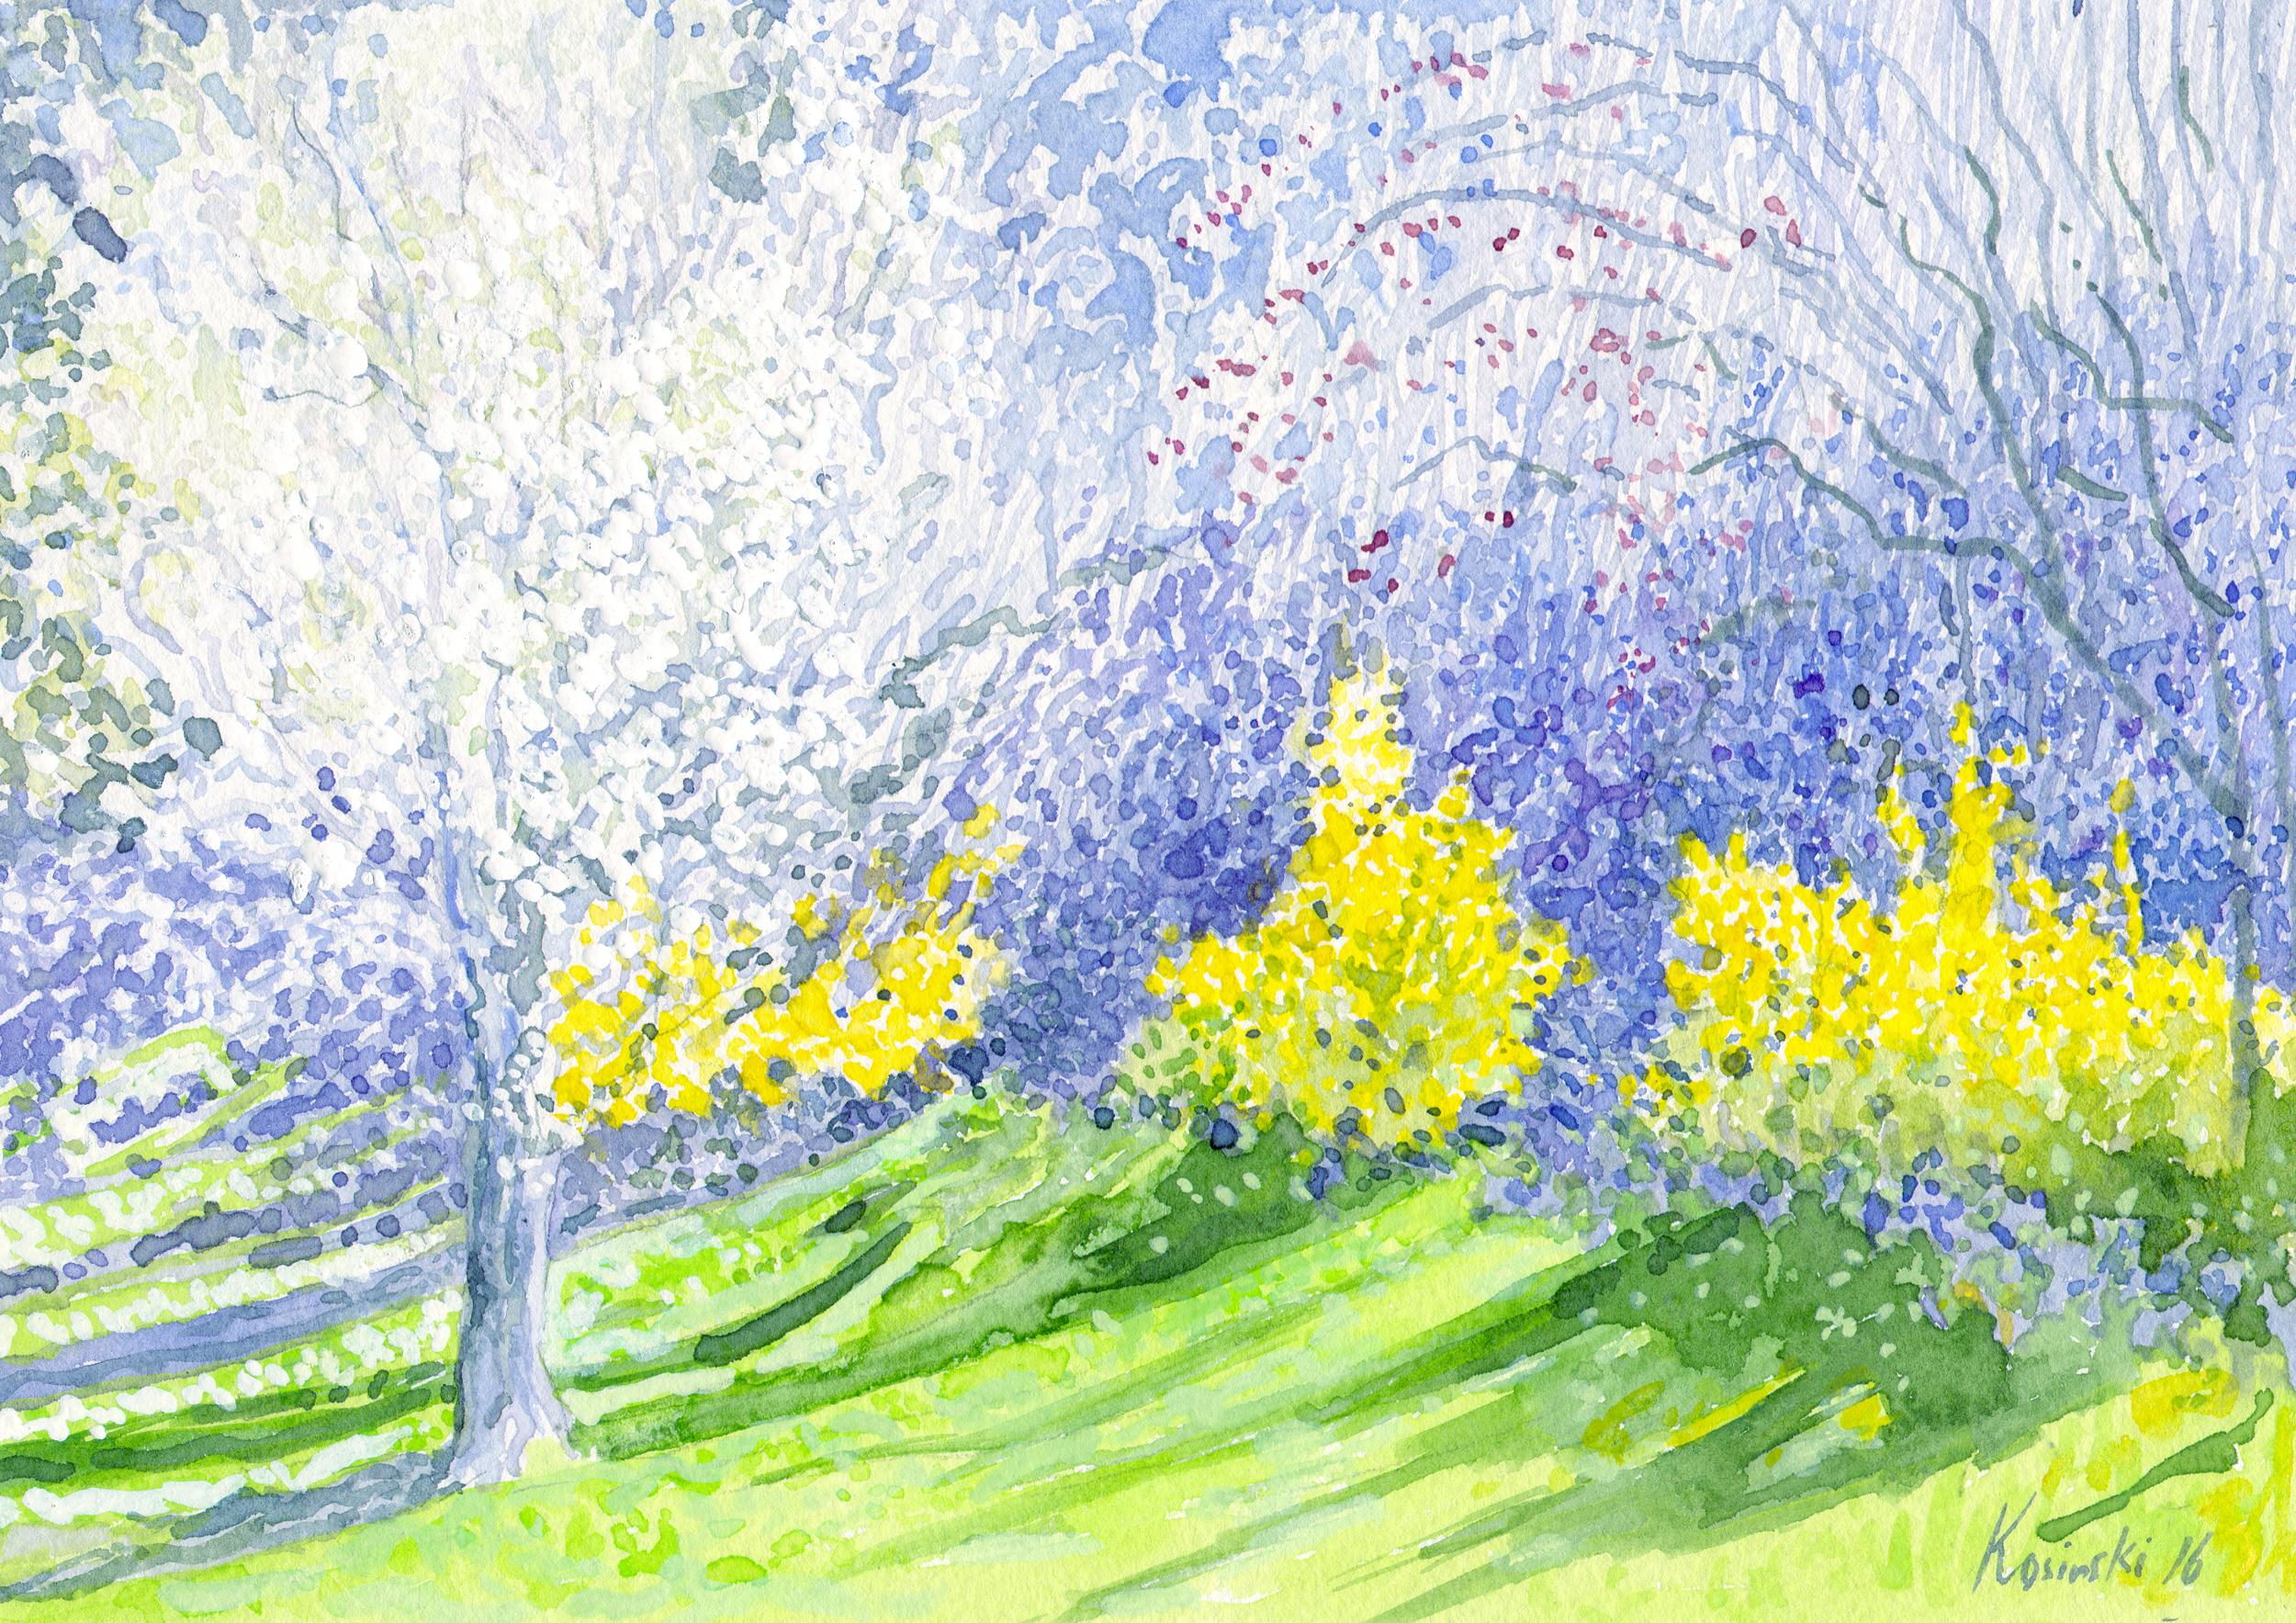 Spring Blossom, Ashe County